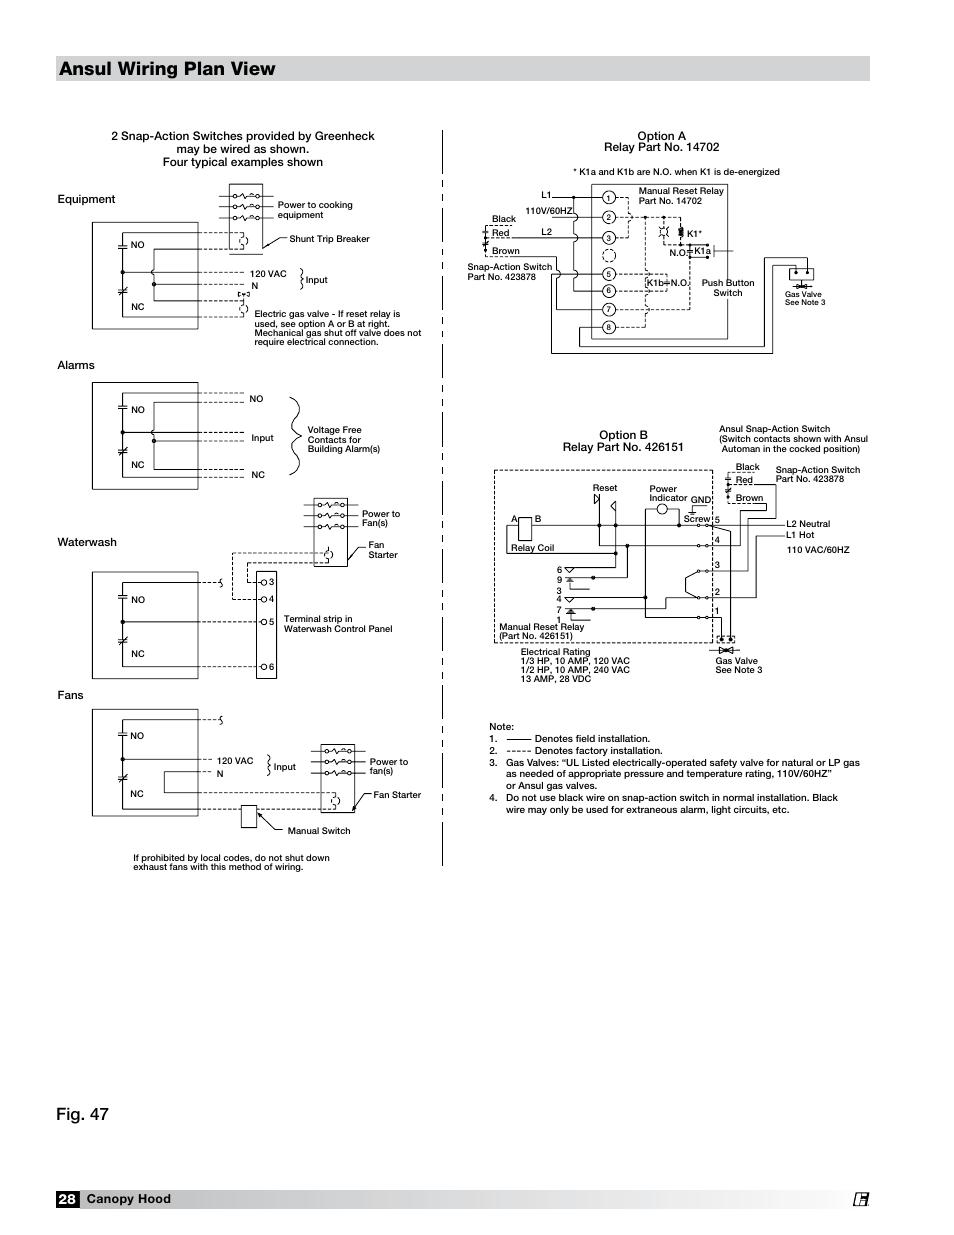 greenheck fan 452413 page28?resize\\\\\\\\\\\\\\\\\\\=954%2C1235 jf8 wiring diagram yamaha golf cars gandul 45 77 79 119  at eliteediting.co